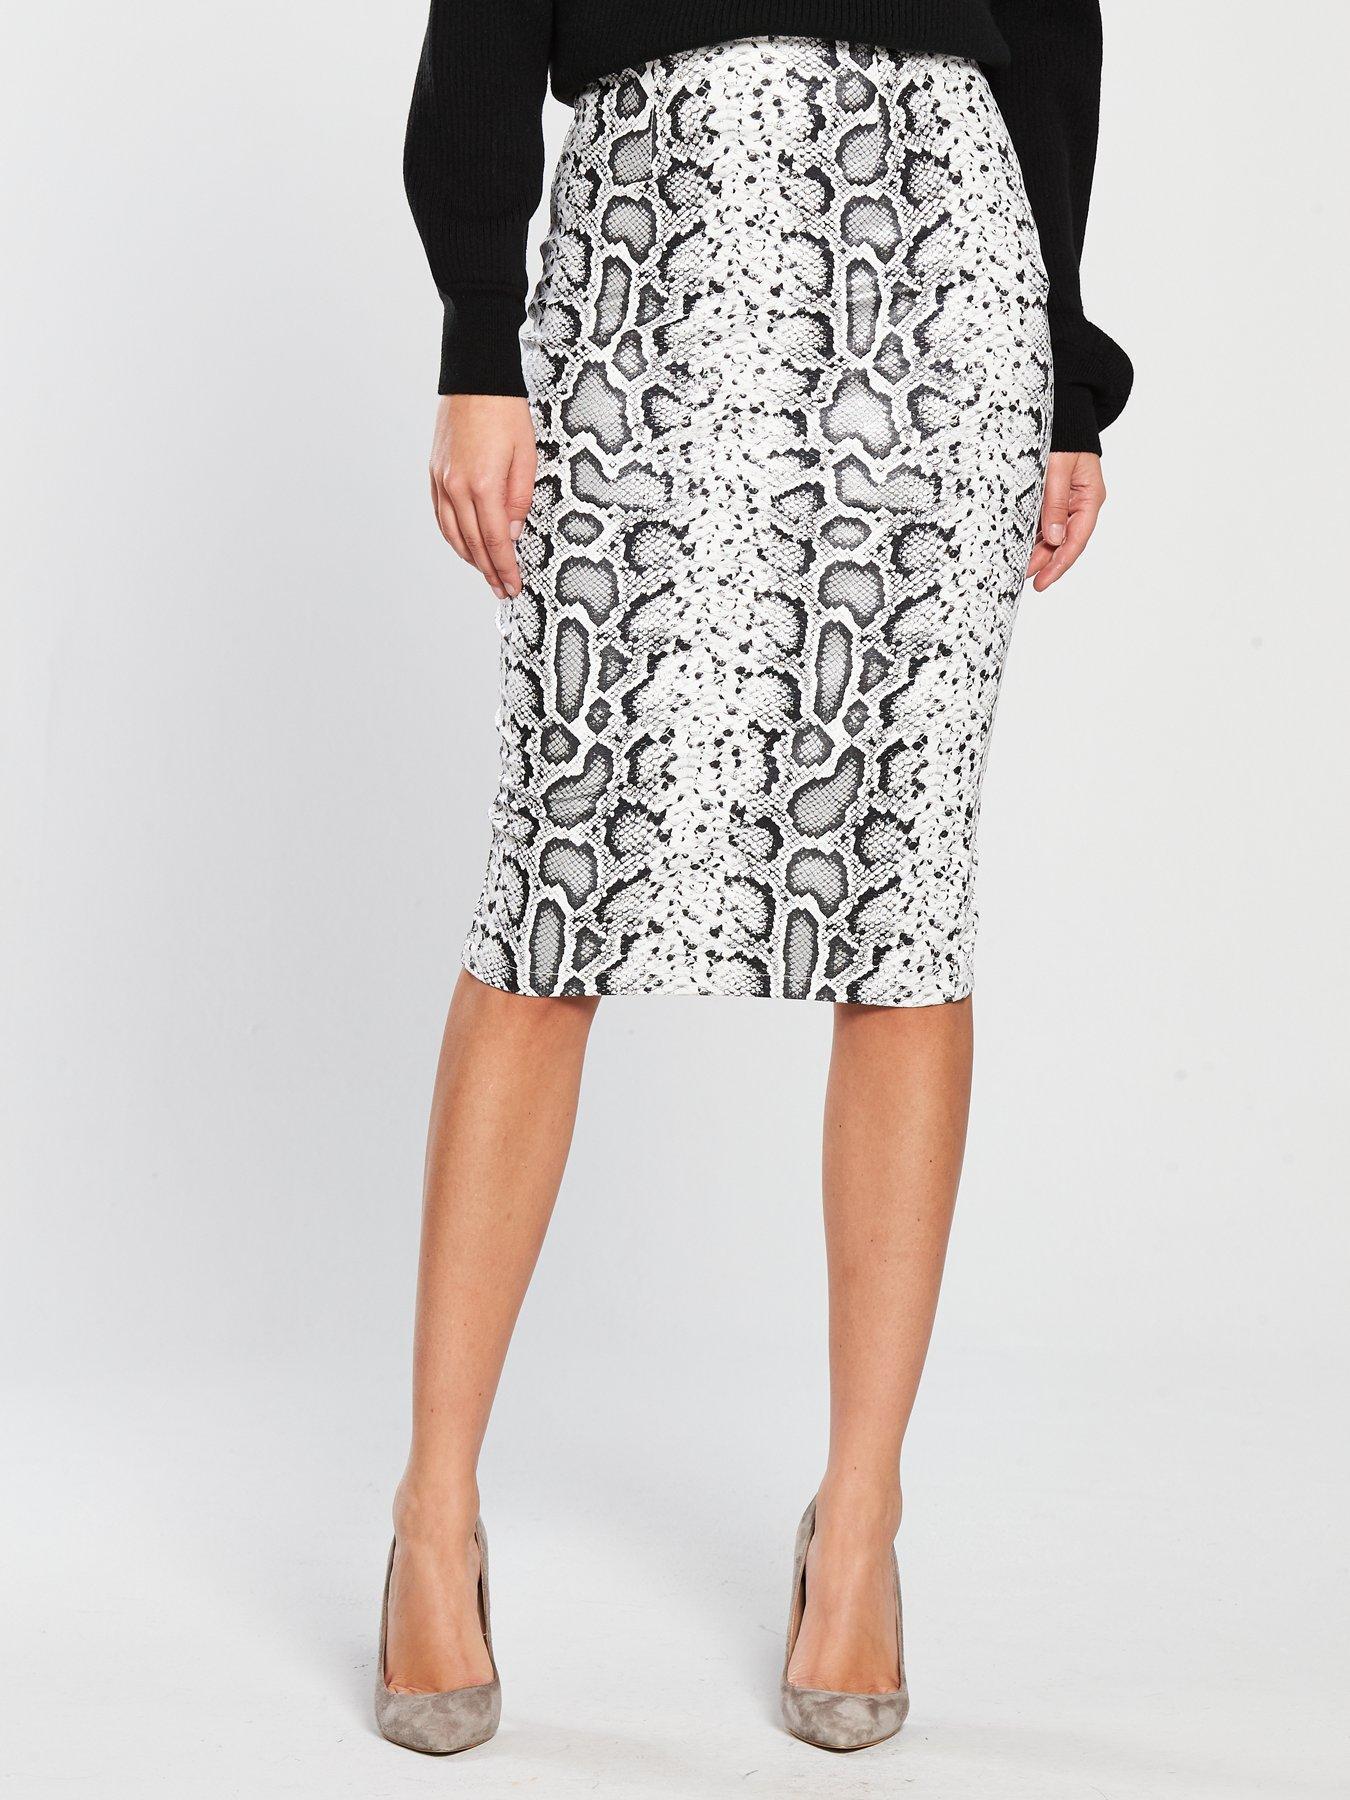 White Snake Skirt (SOLD OUT)